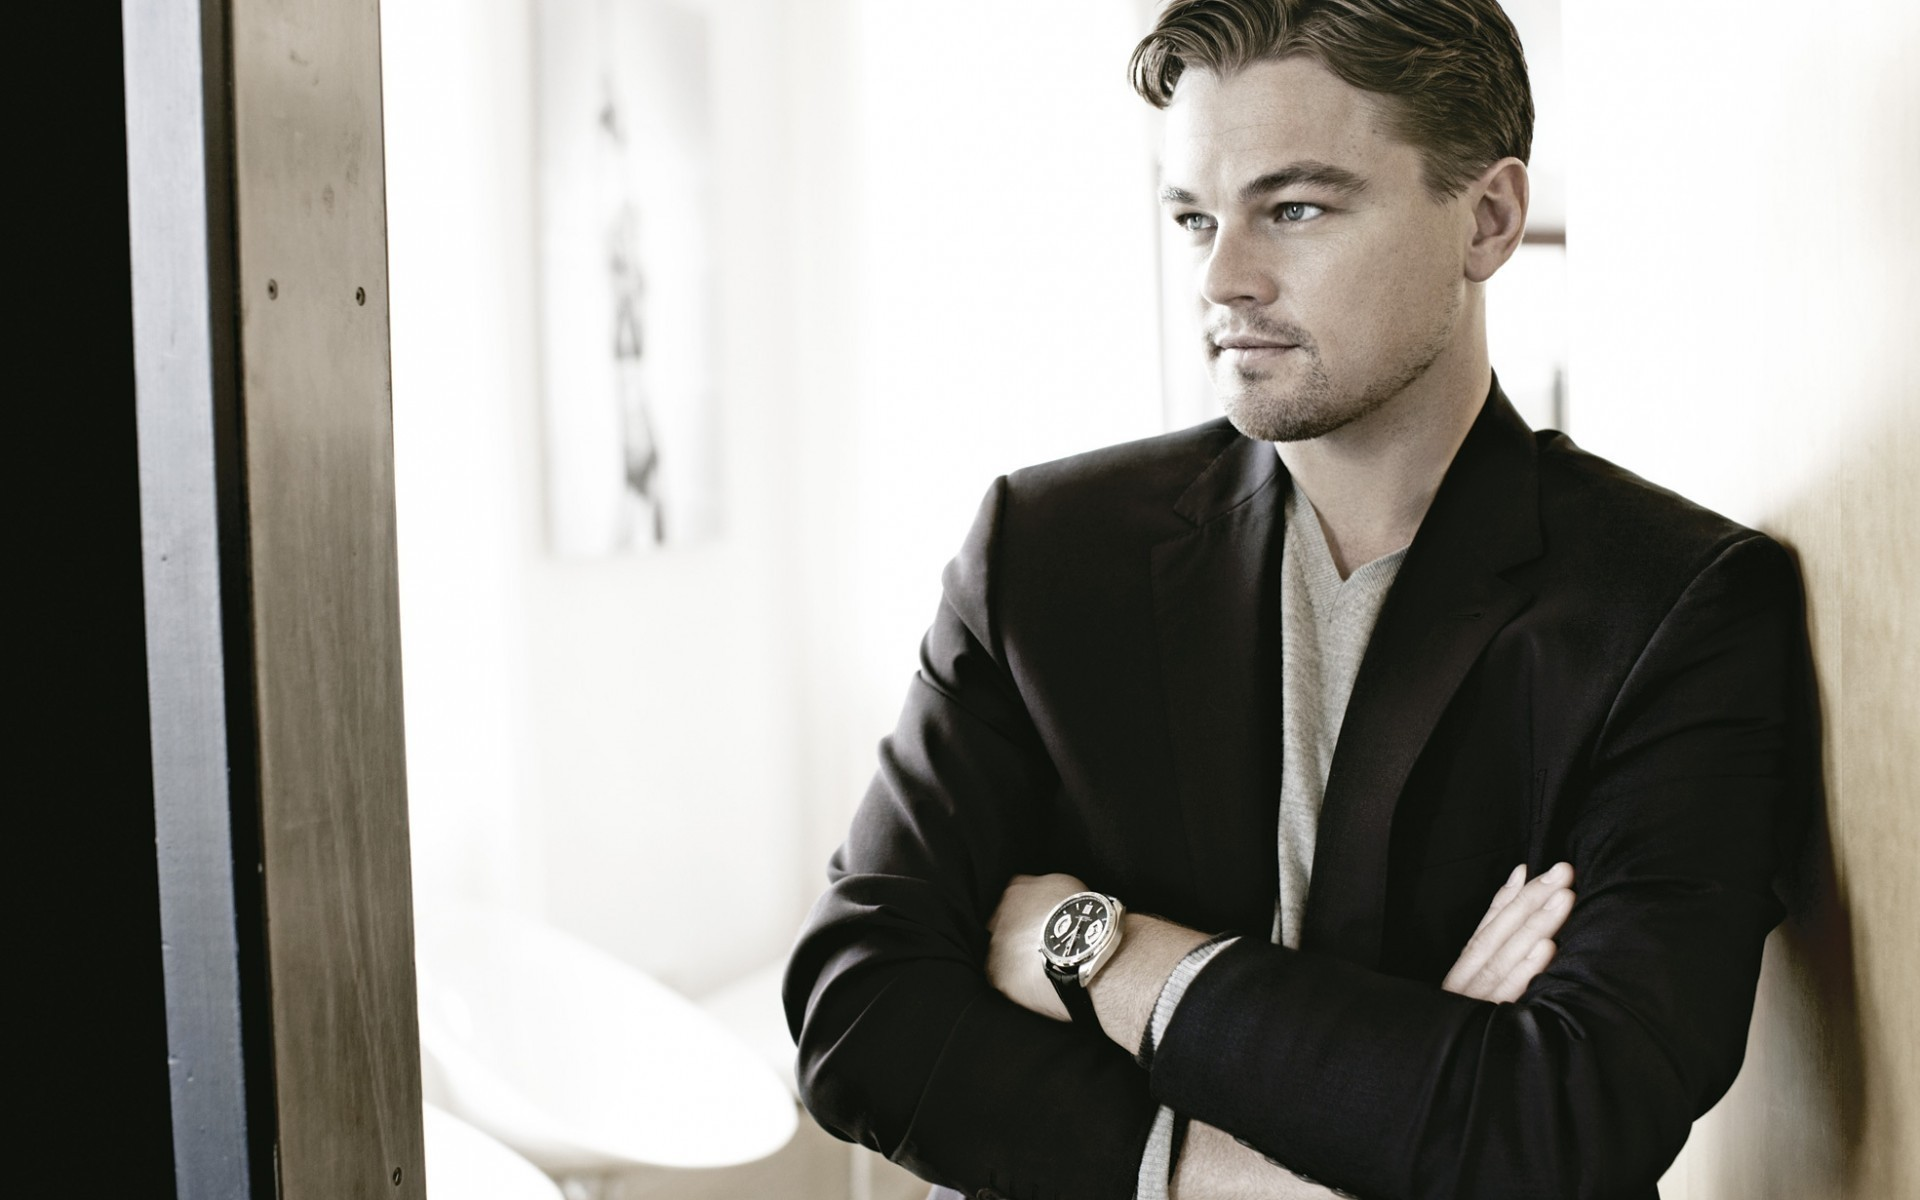 Leonardo Dicaprio Profile Look Android Wallpapers